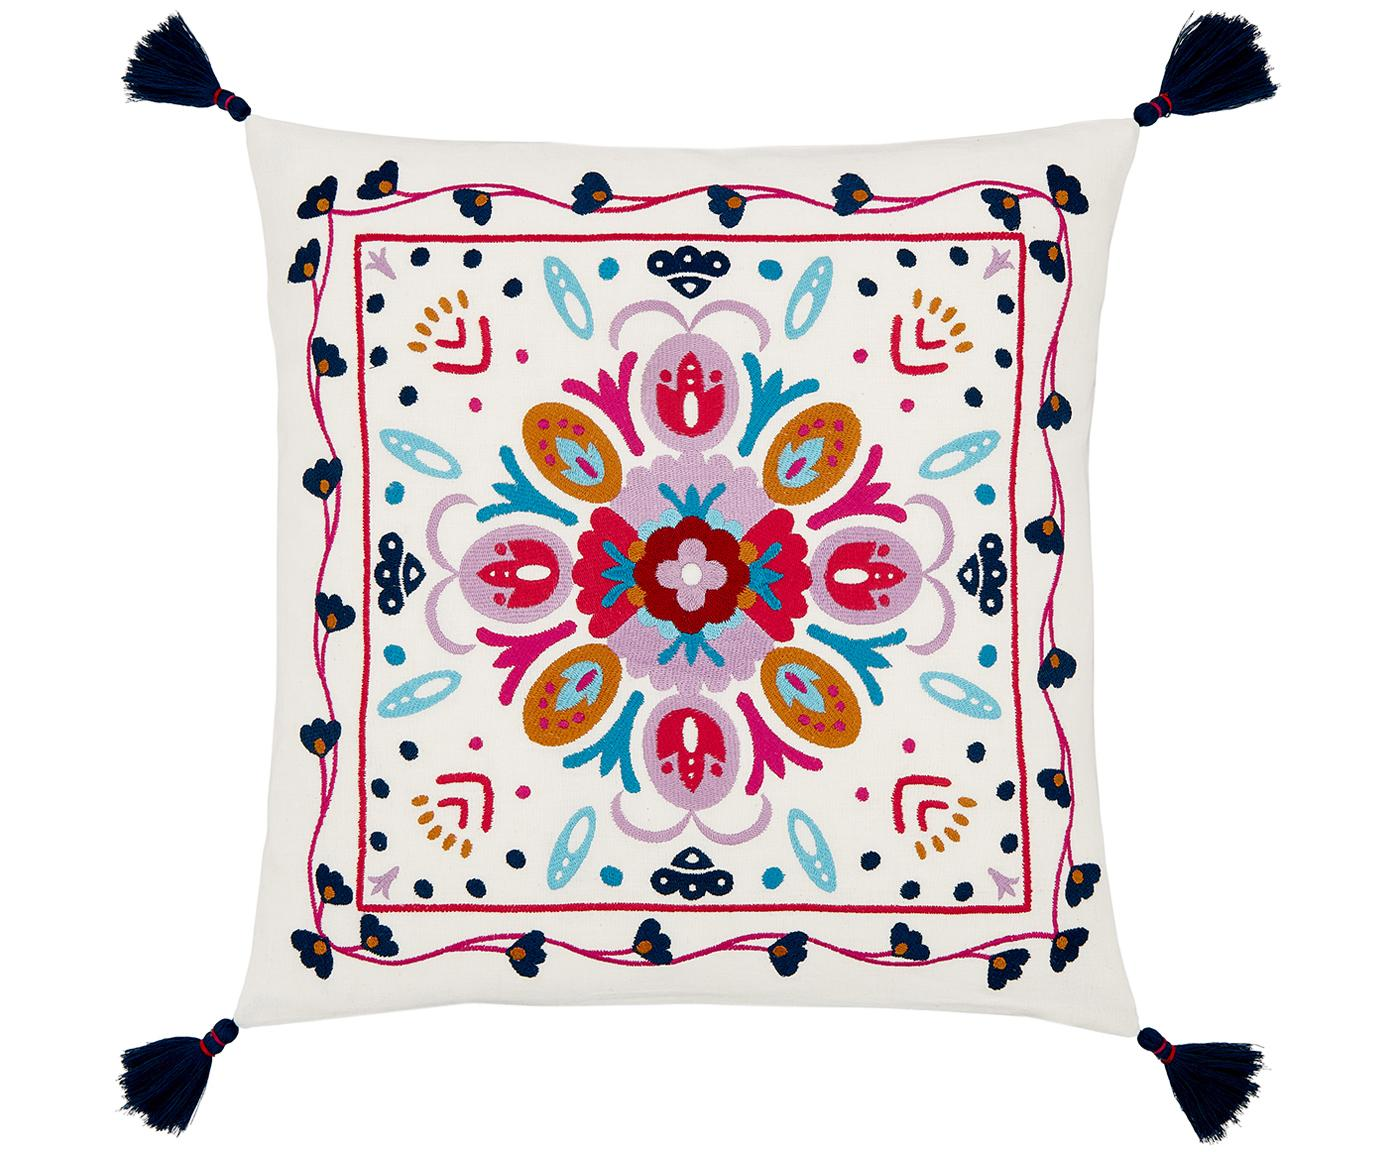 Funda de cojín bordada Flower Power, Algodón, Blanco crema, multicolor, An 45 x L 45 cm